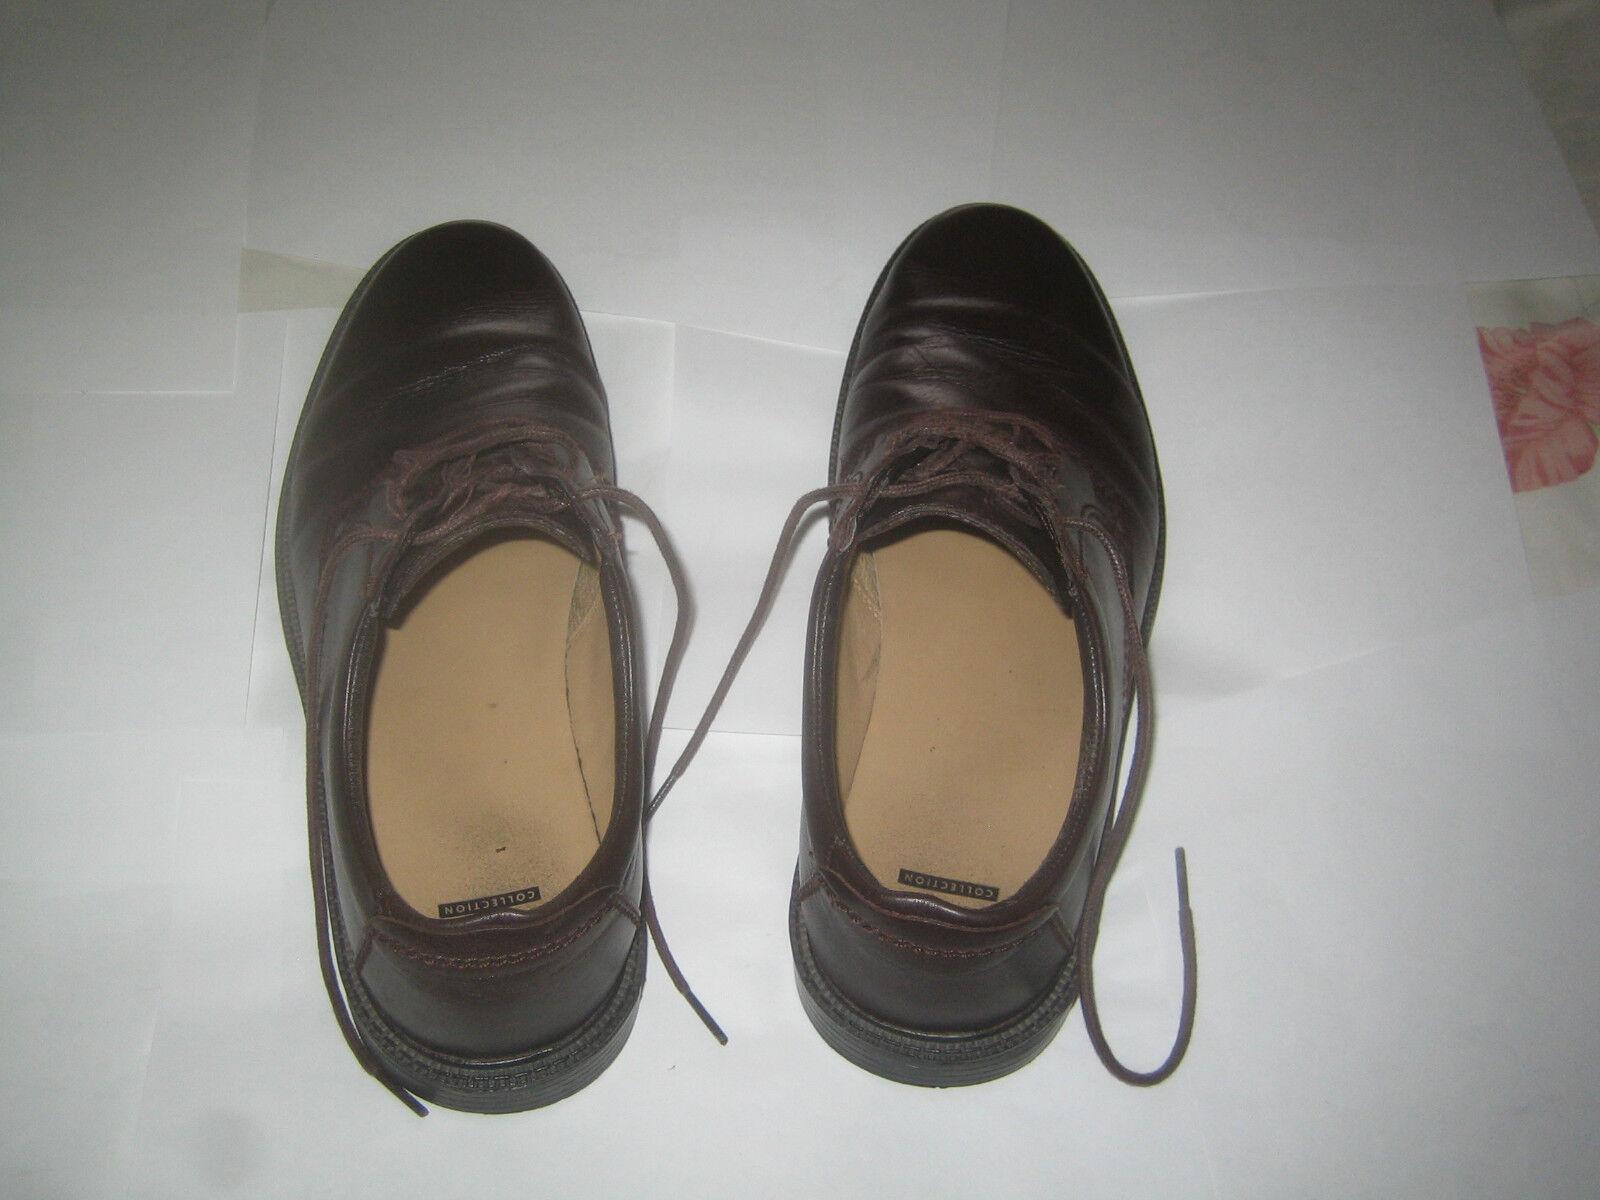 Mens shoes ' – Clarks ' – brown – ' size 9.5 1e4651